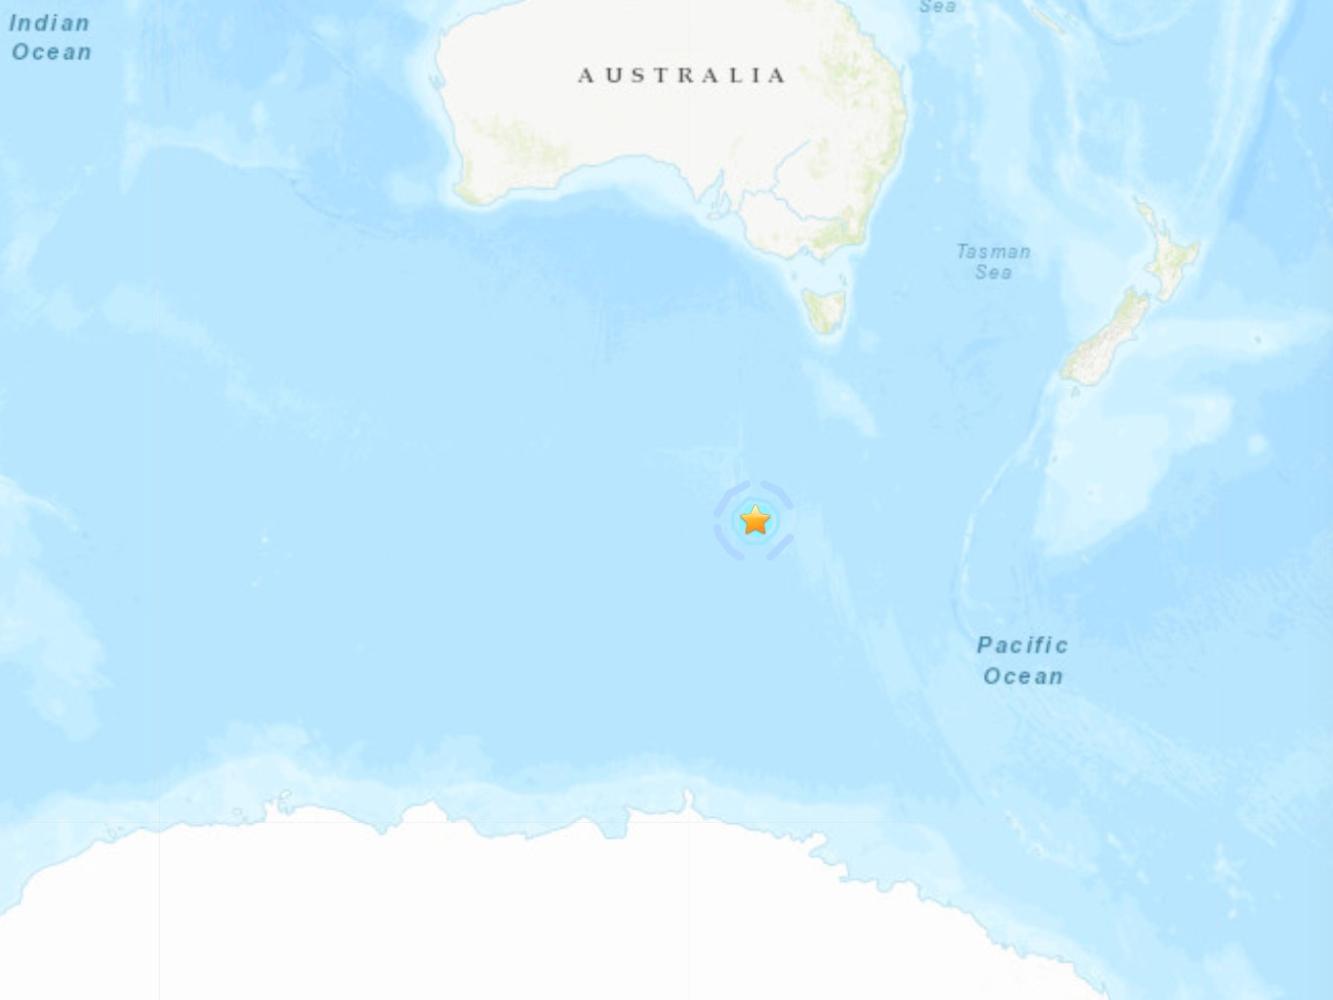 5.5-magnitude quake hits west of Macquarie Island -- USGS